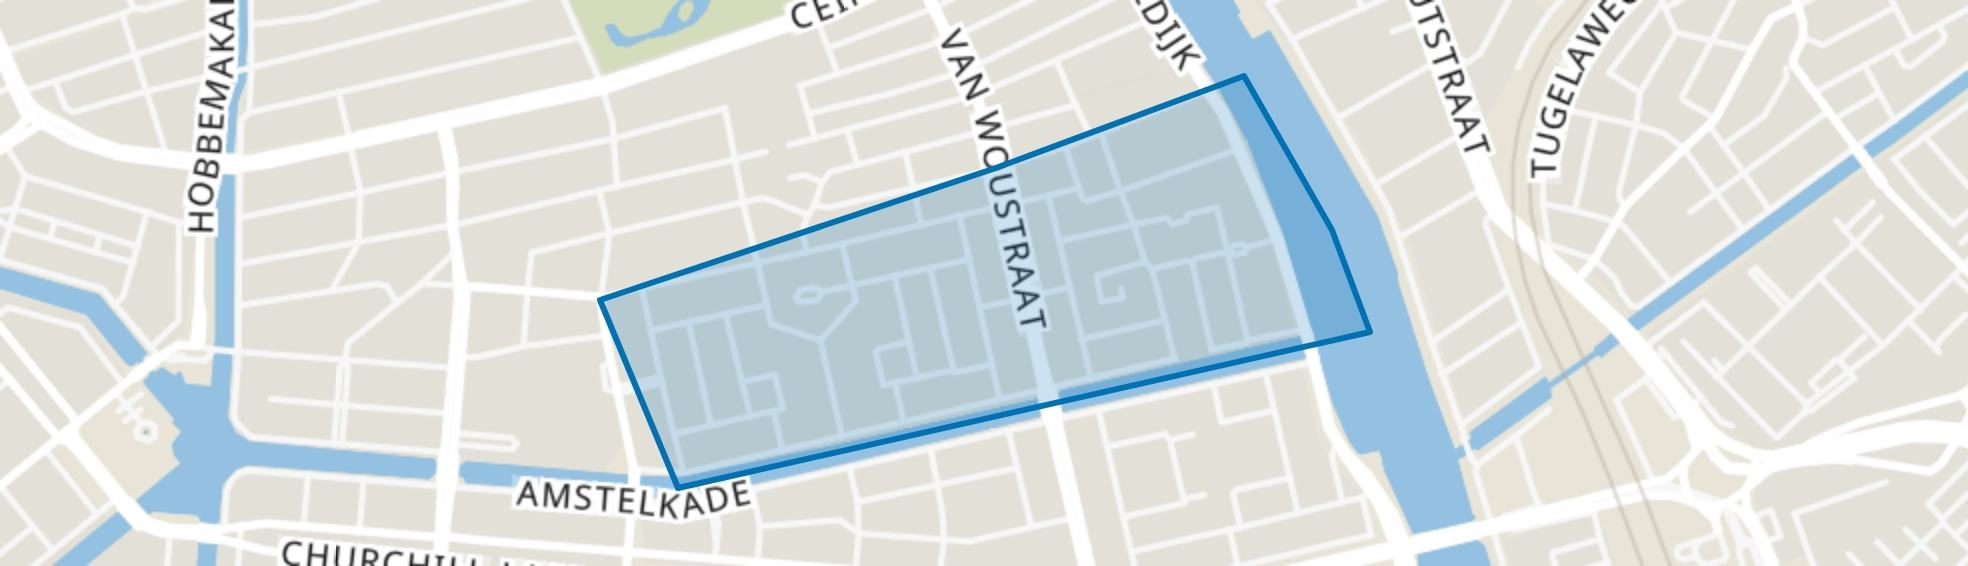 Zuid Pijp, Amsterdam map